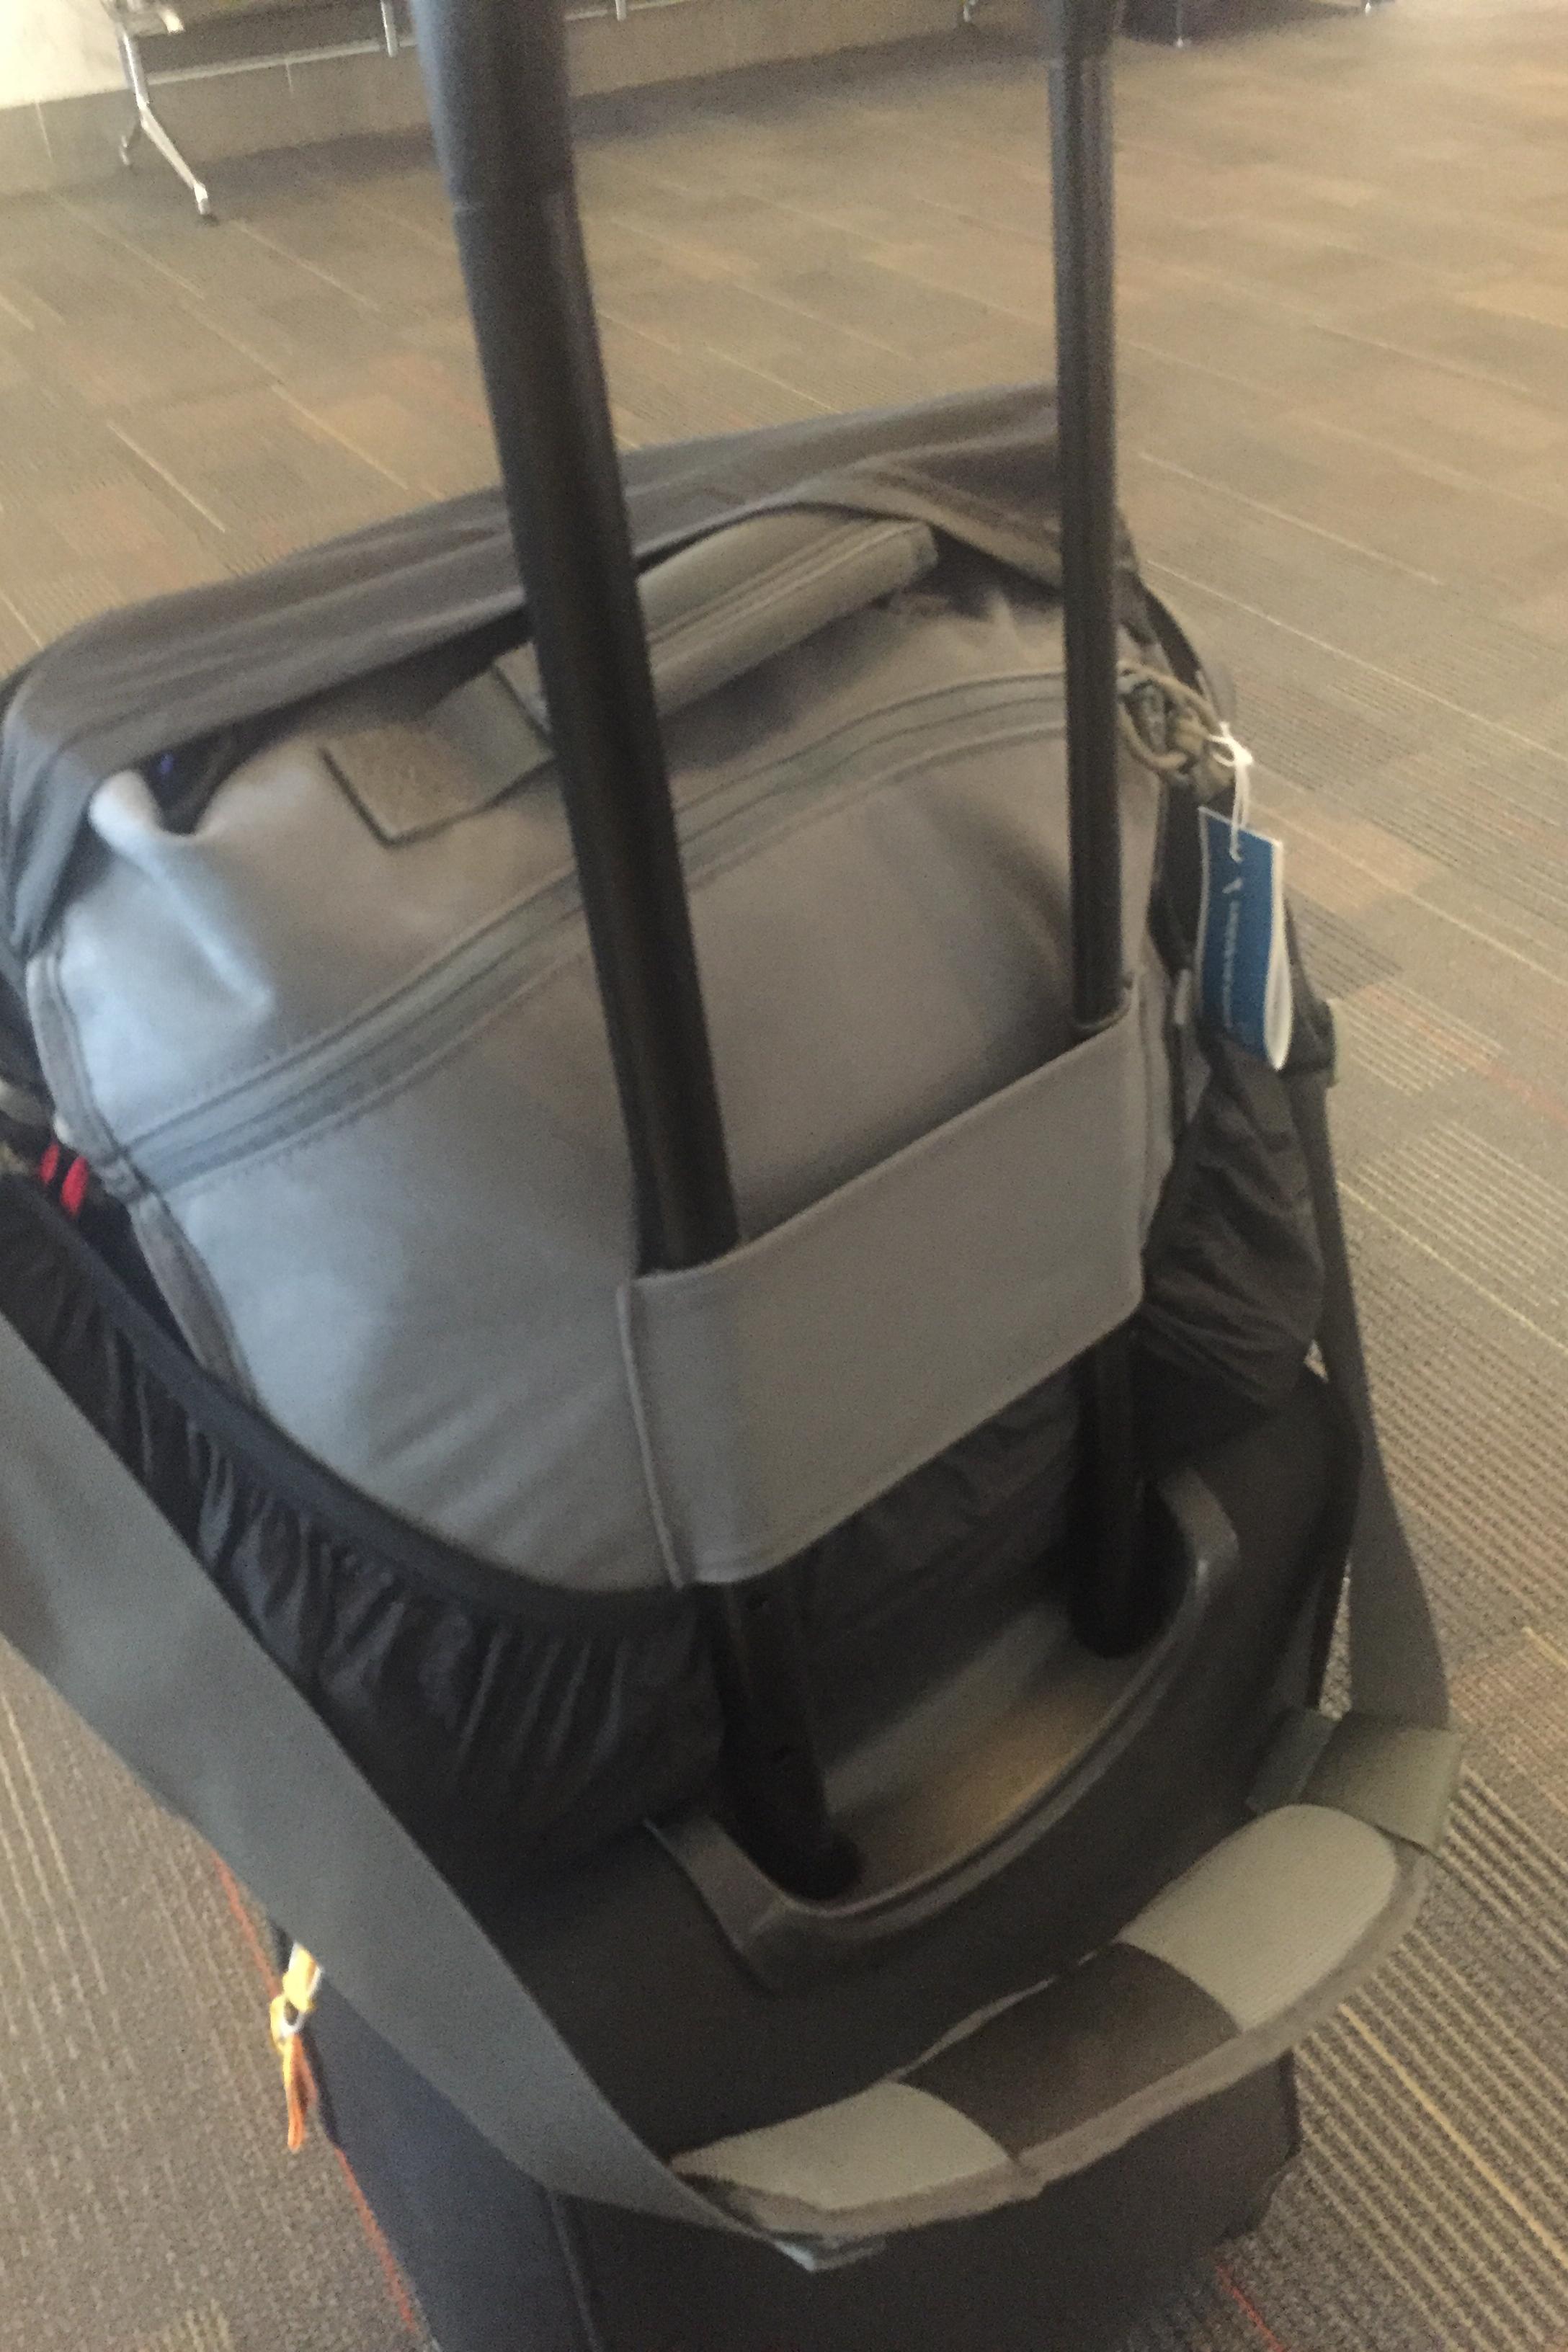 Vanquish SKITCH-12 bag wrapped in Retrospective 30 rain cover.